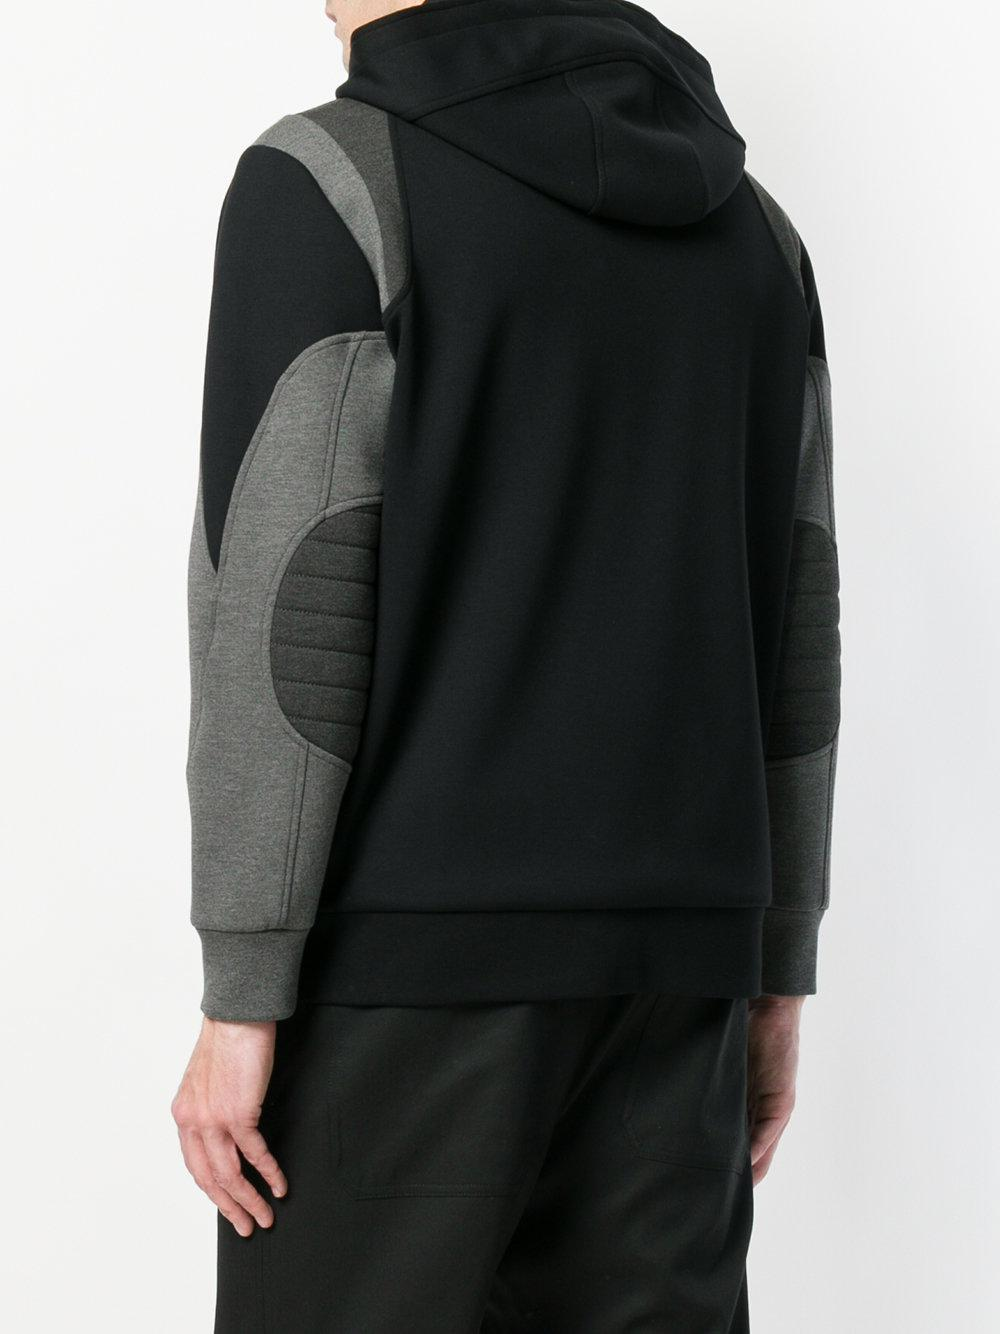 Neil Barrett Cotton Hooded Style Jacket in Black for Men